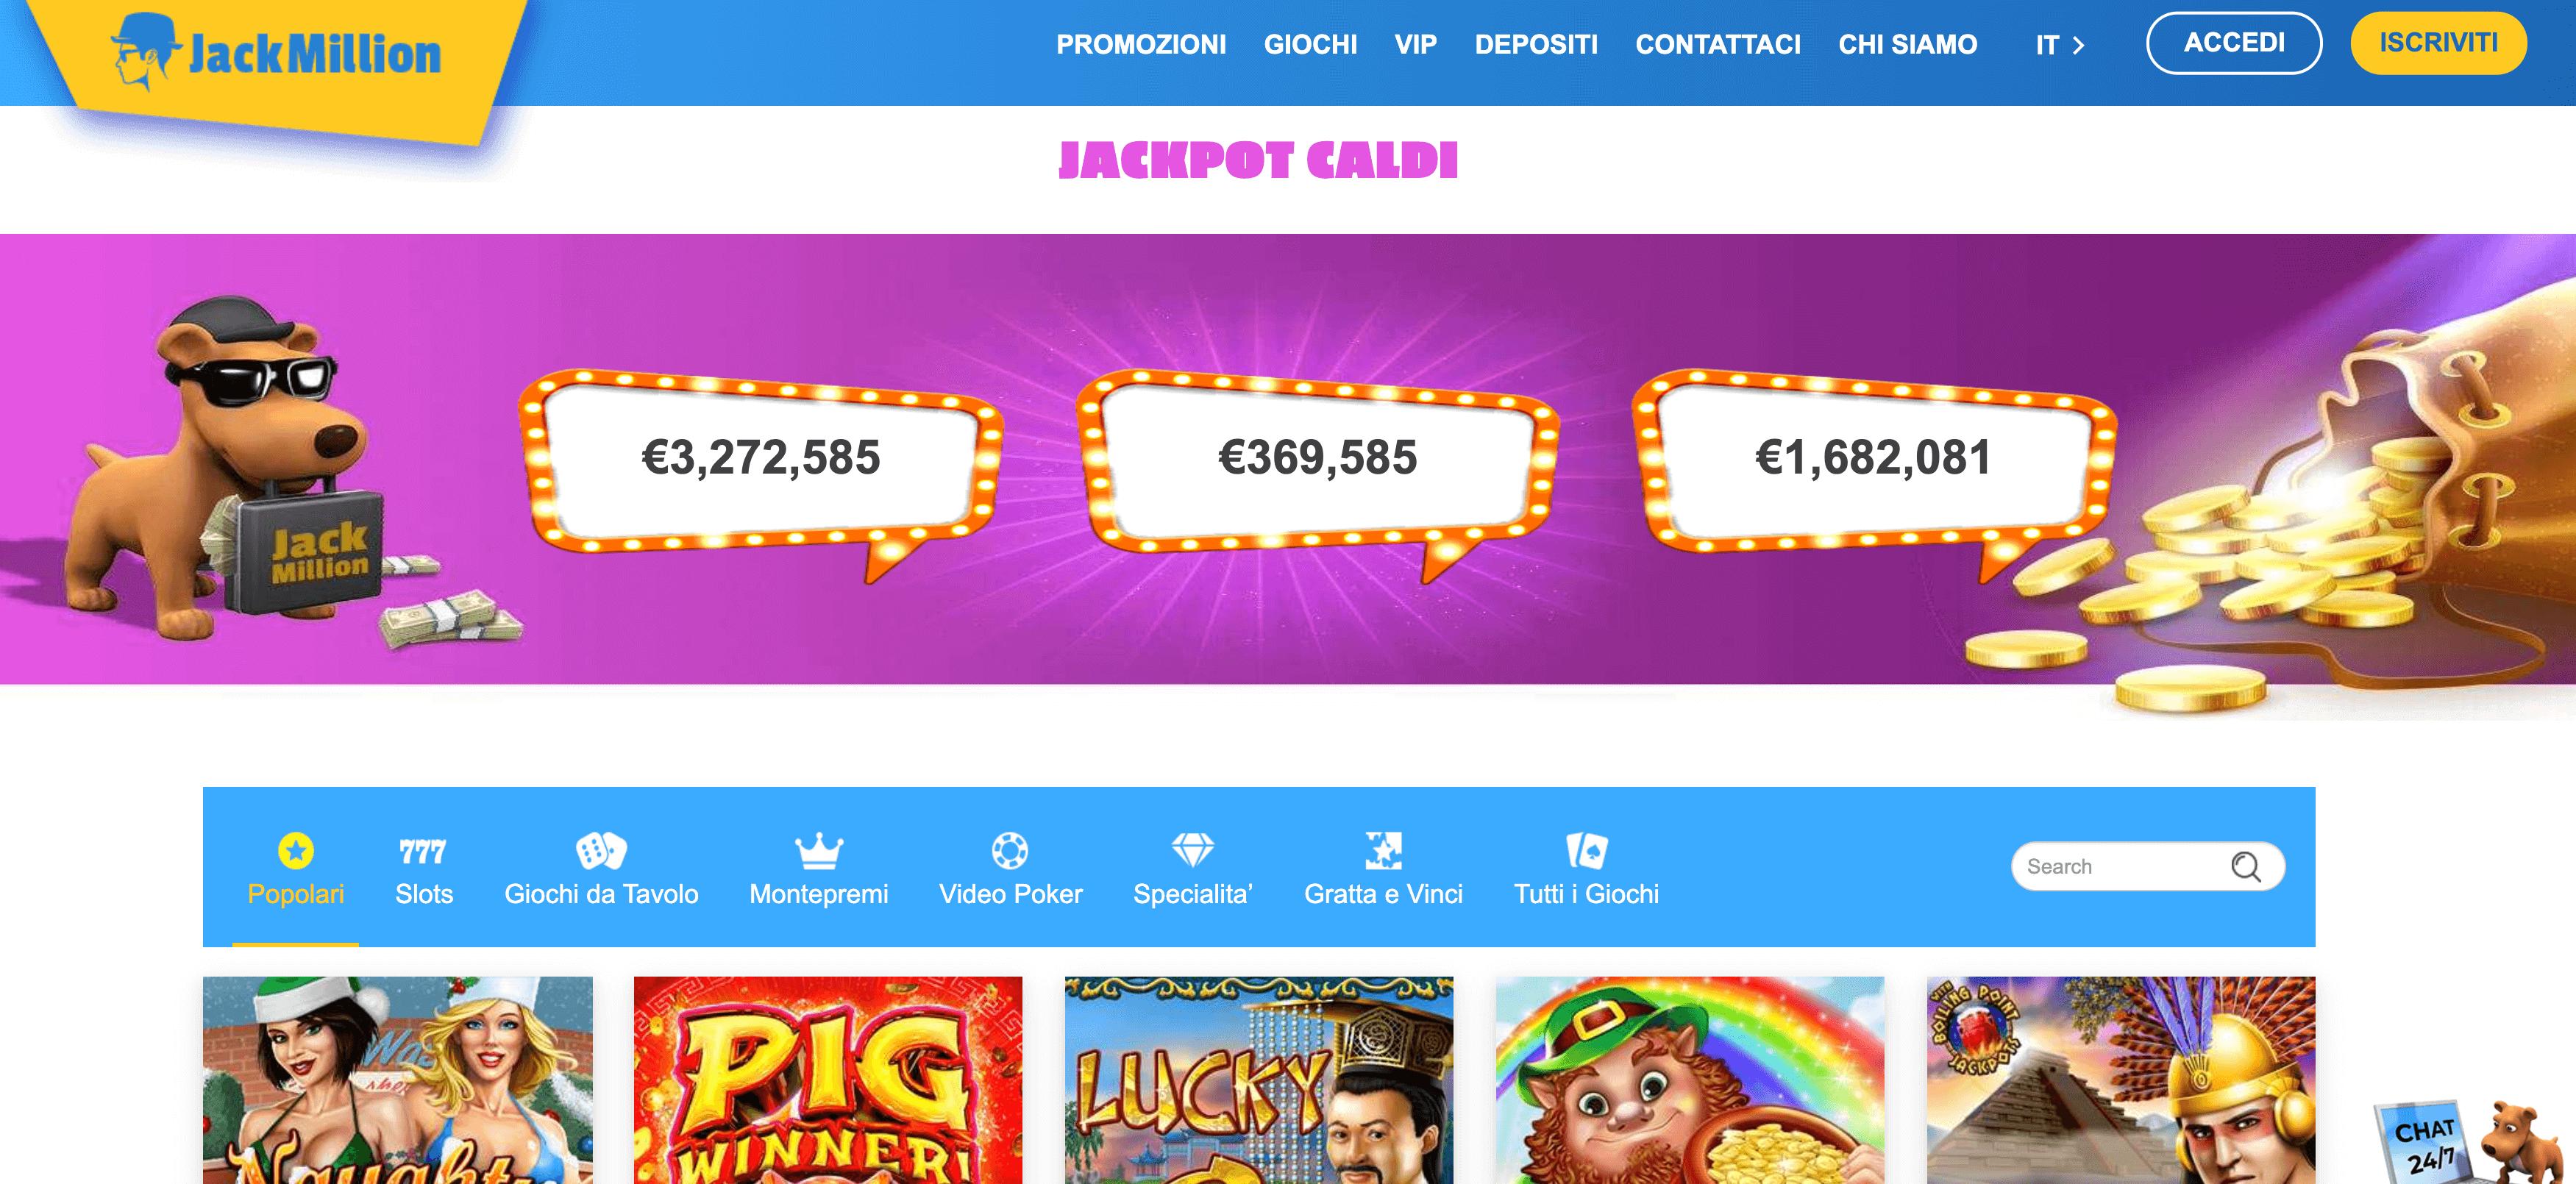 jackmilion casino homepage